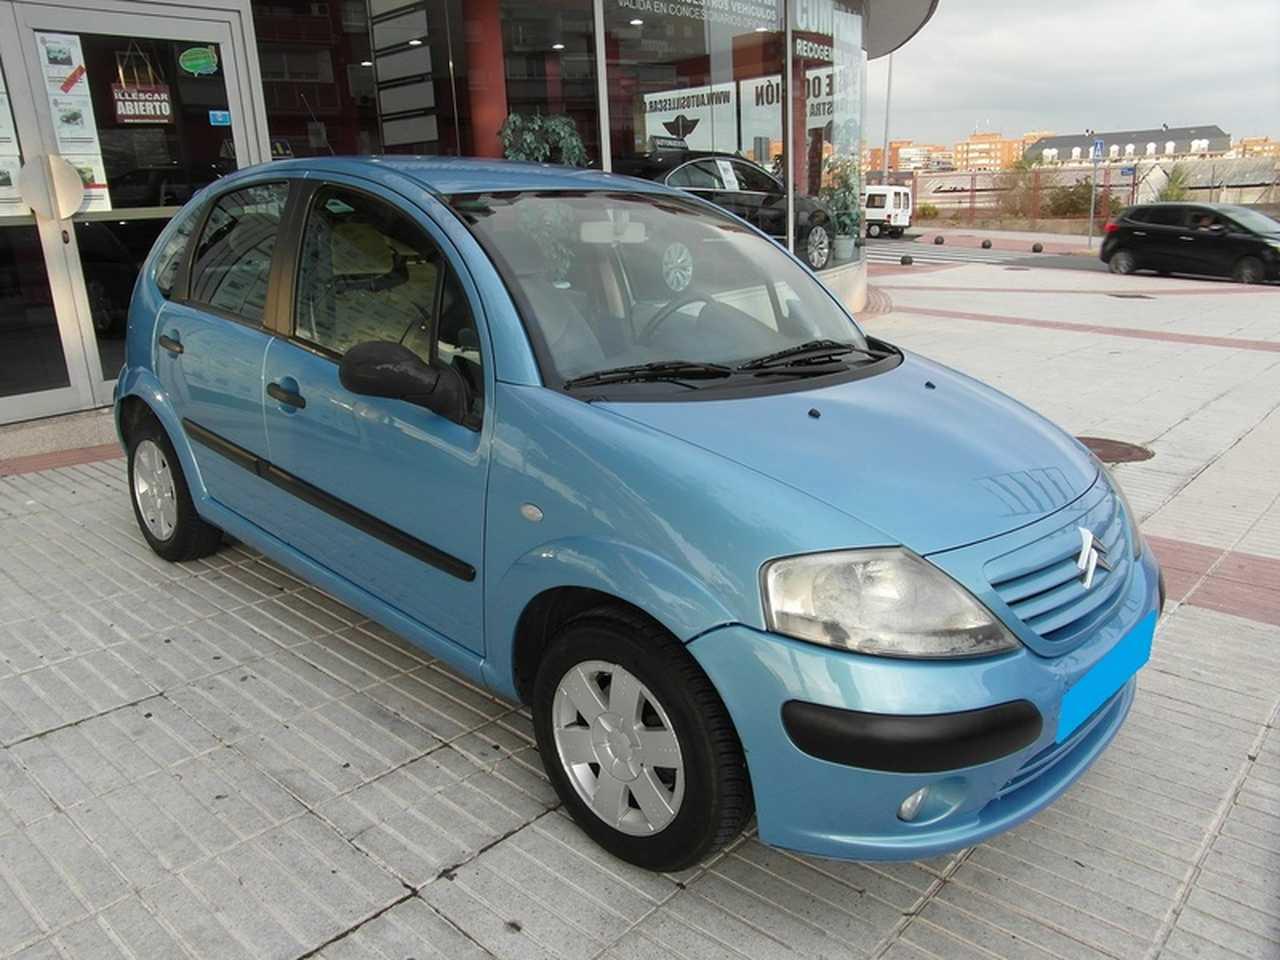 Citroën C3 1.4 I SX PLUS 75 CV MEJOR VER  - Foto 1